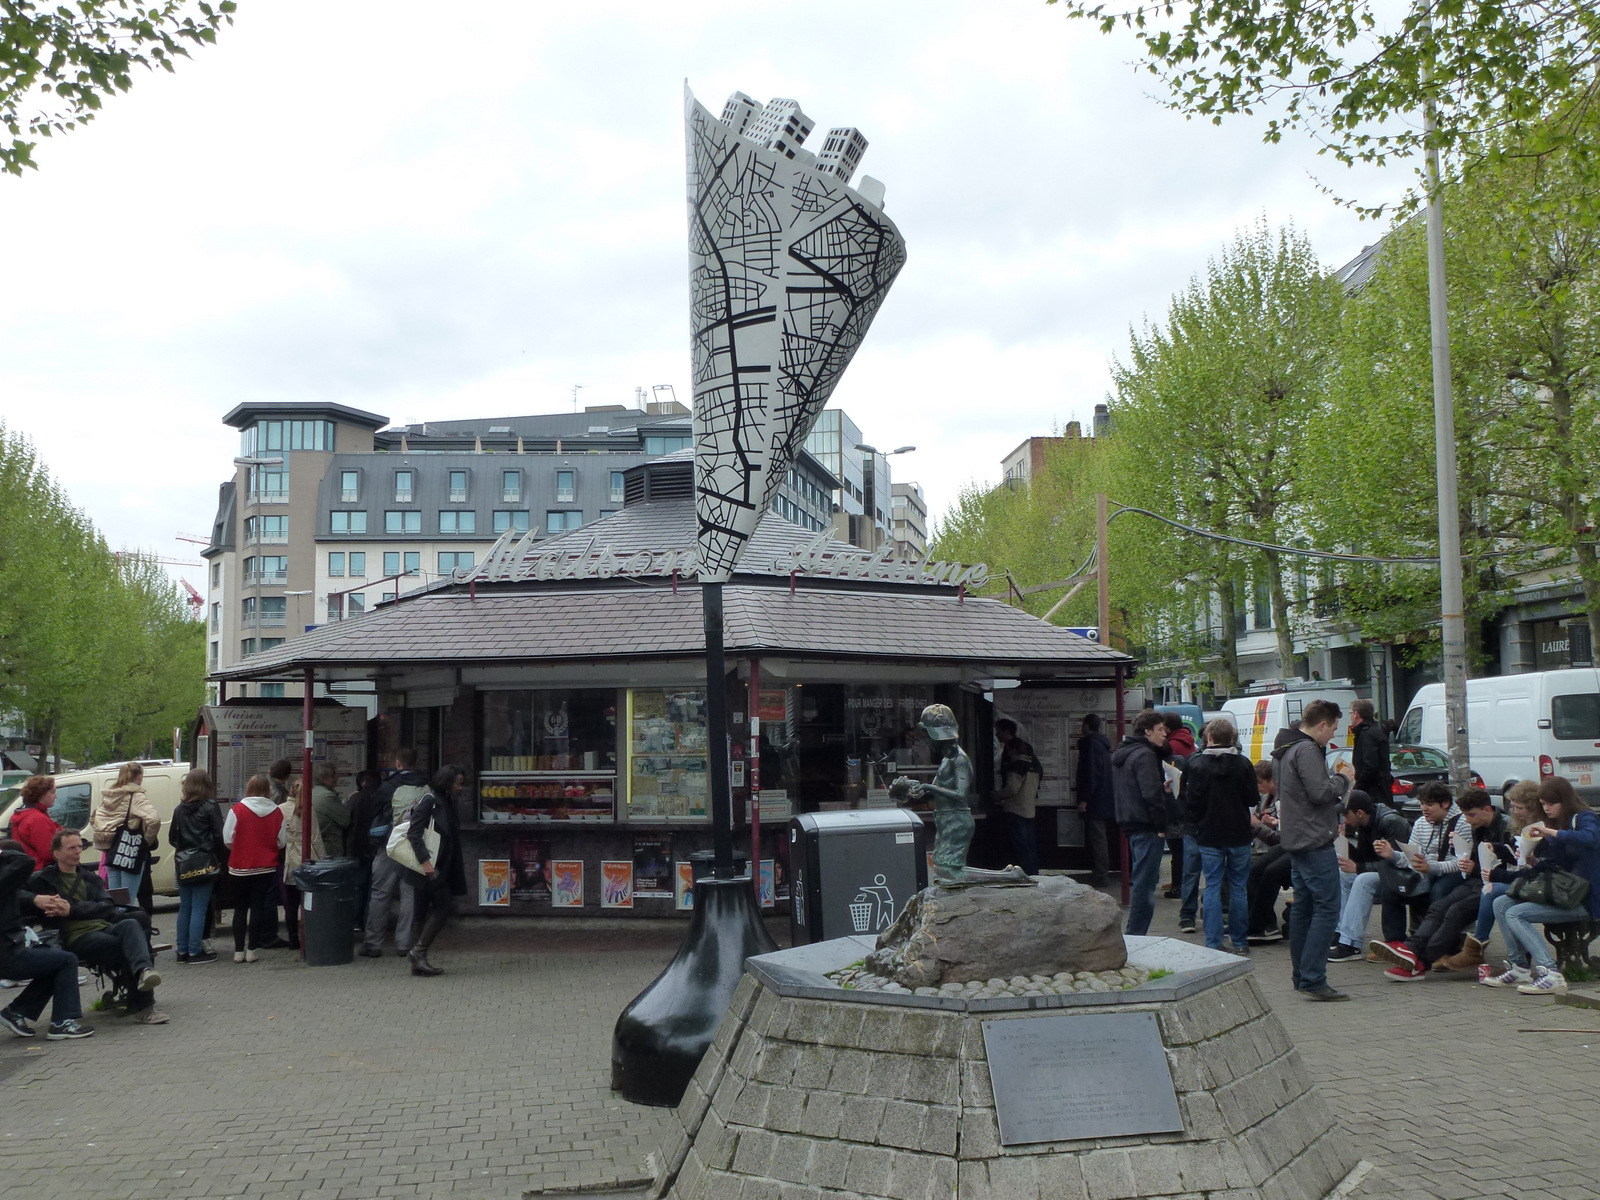 Brusselicious art, place Jourdan